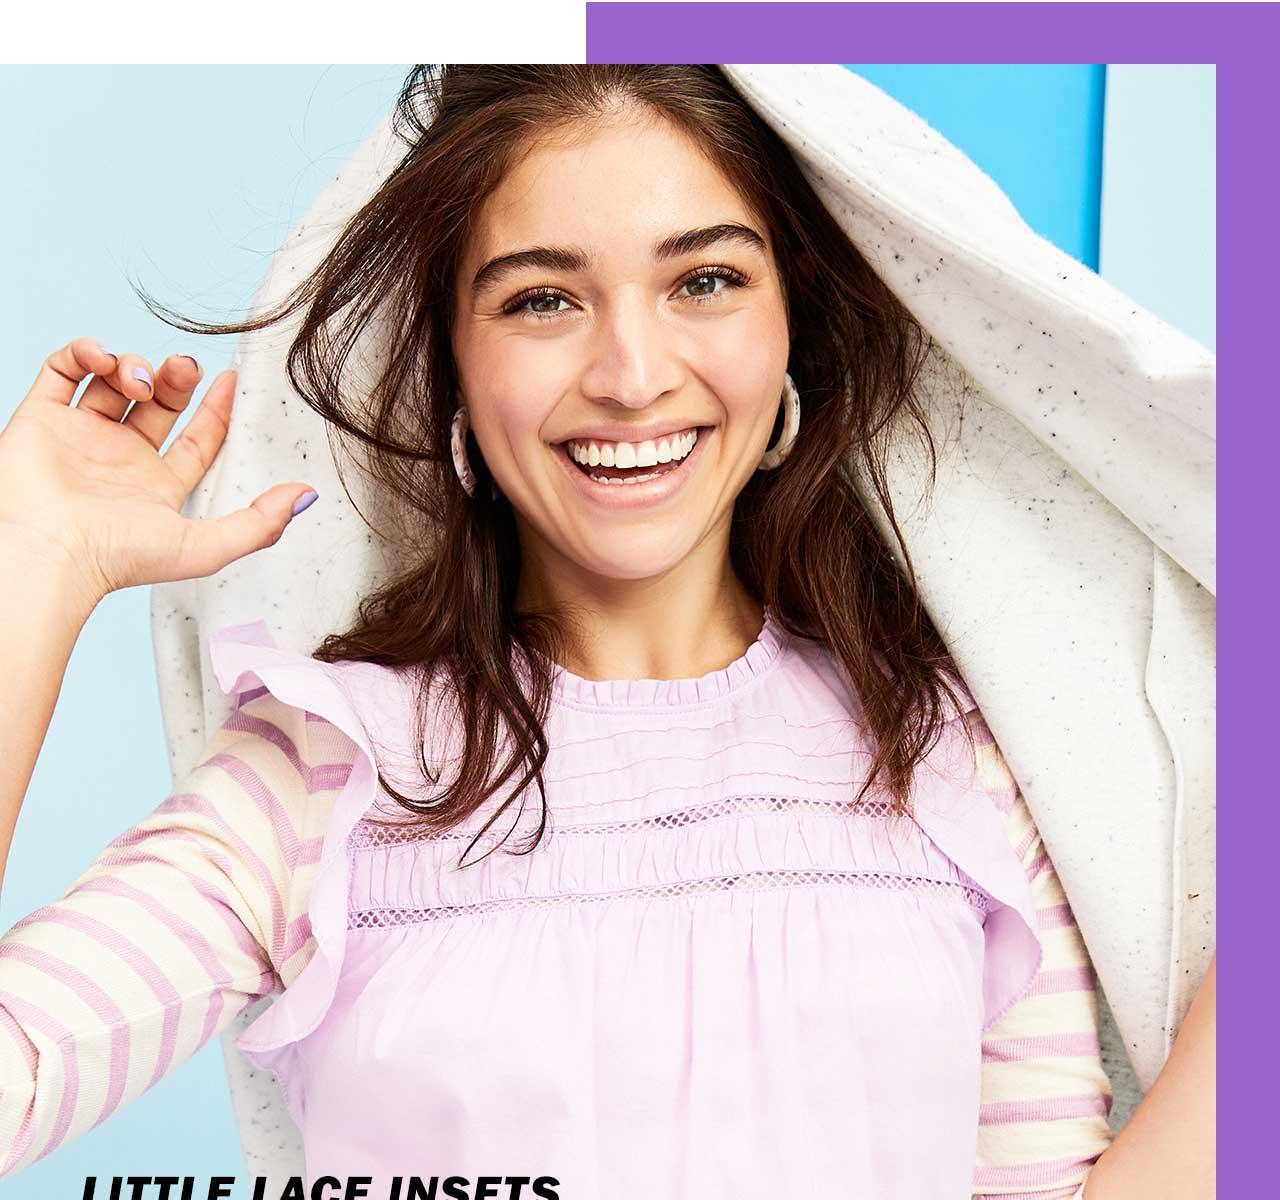 Little lace insets